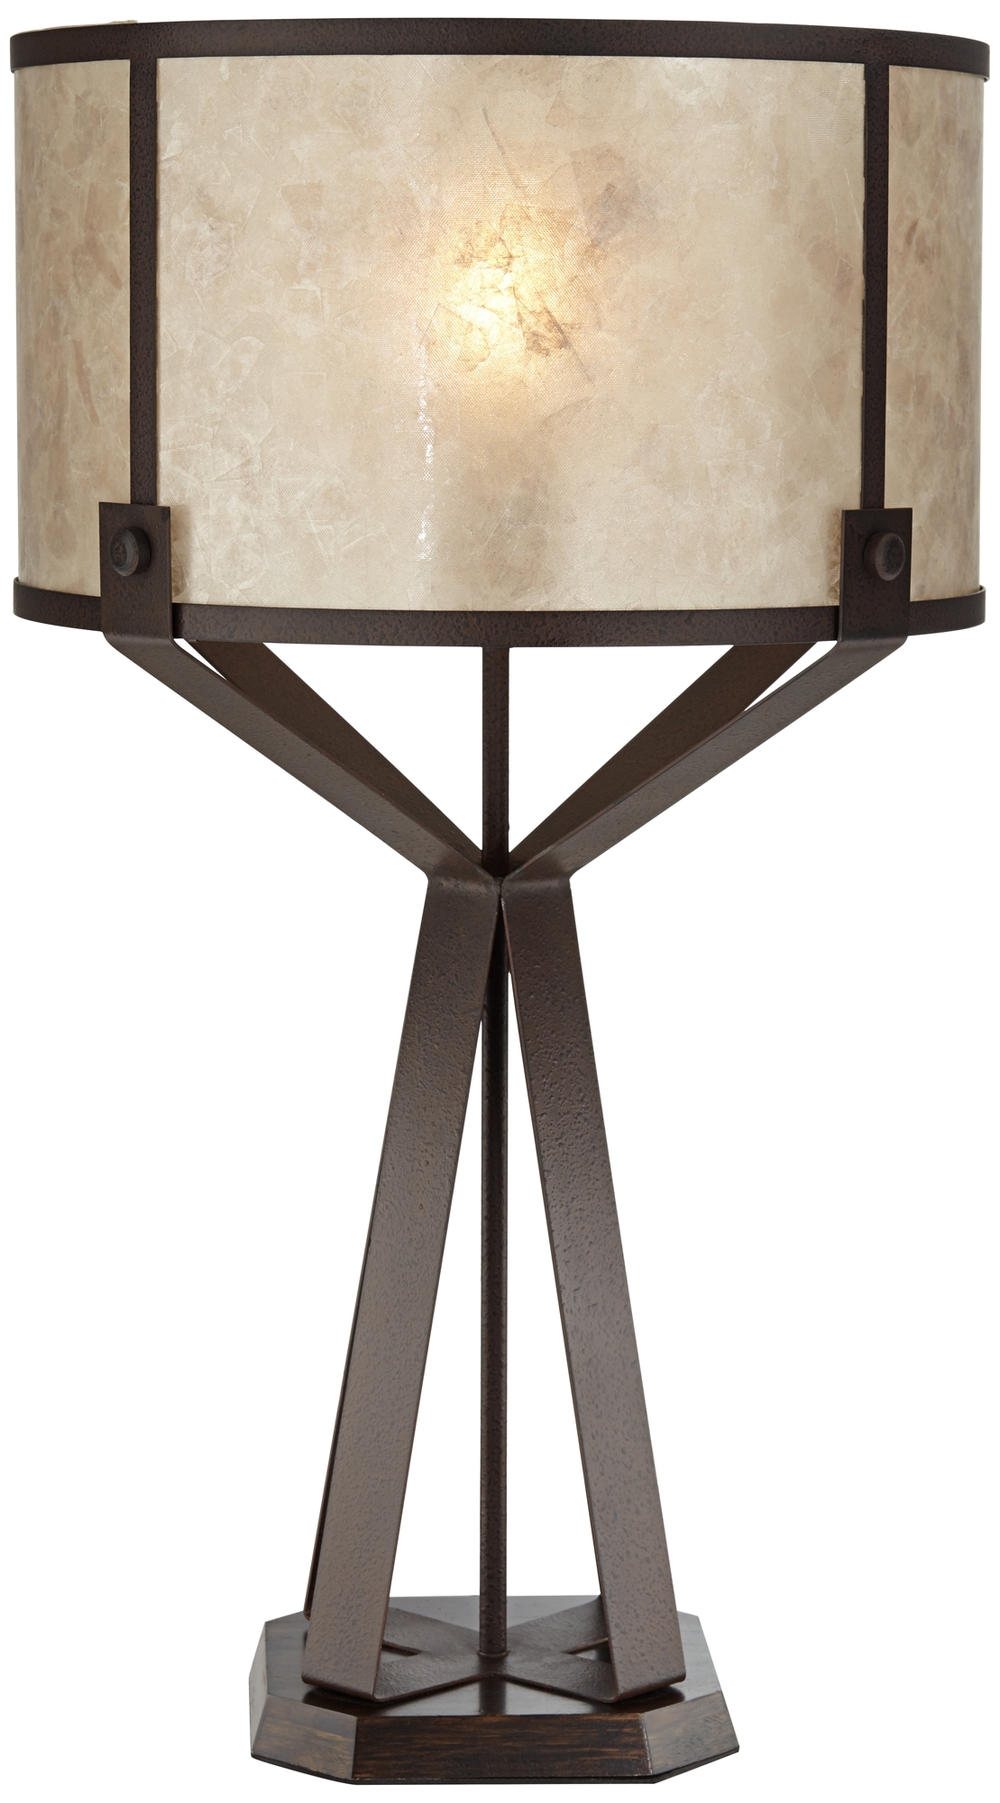 Pacific Coast Lighting - Jasper Table Lamp